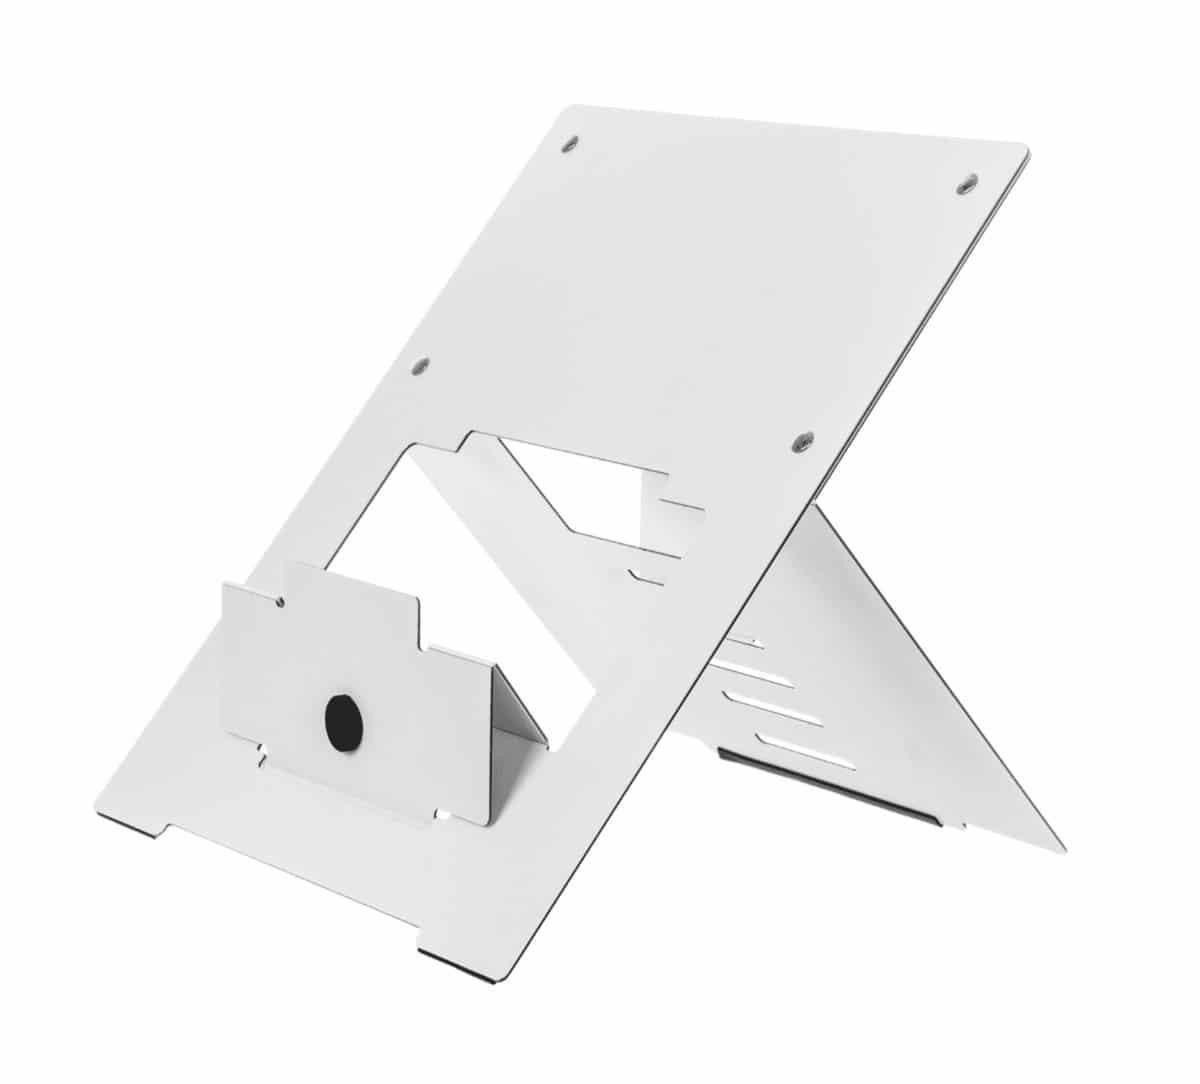 R-GO Riser laptopstandaard wit